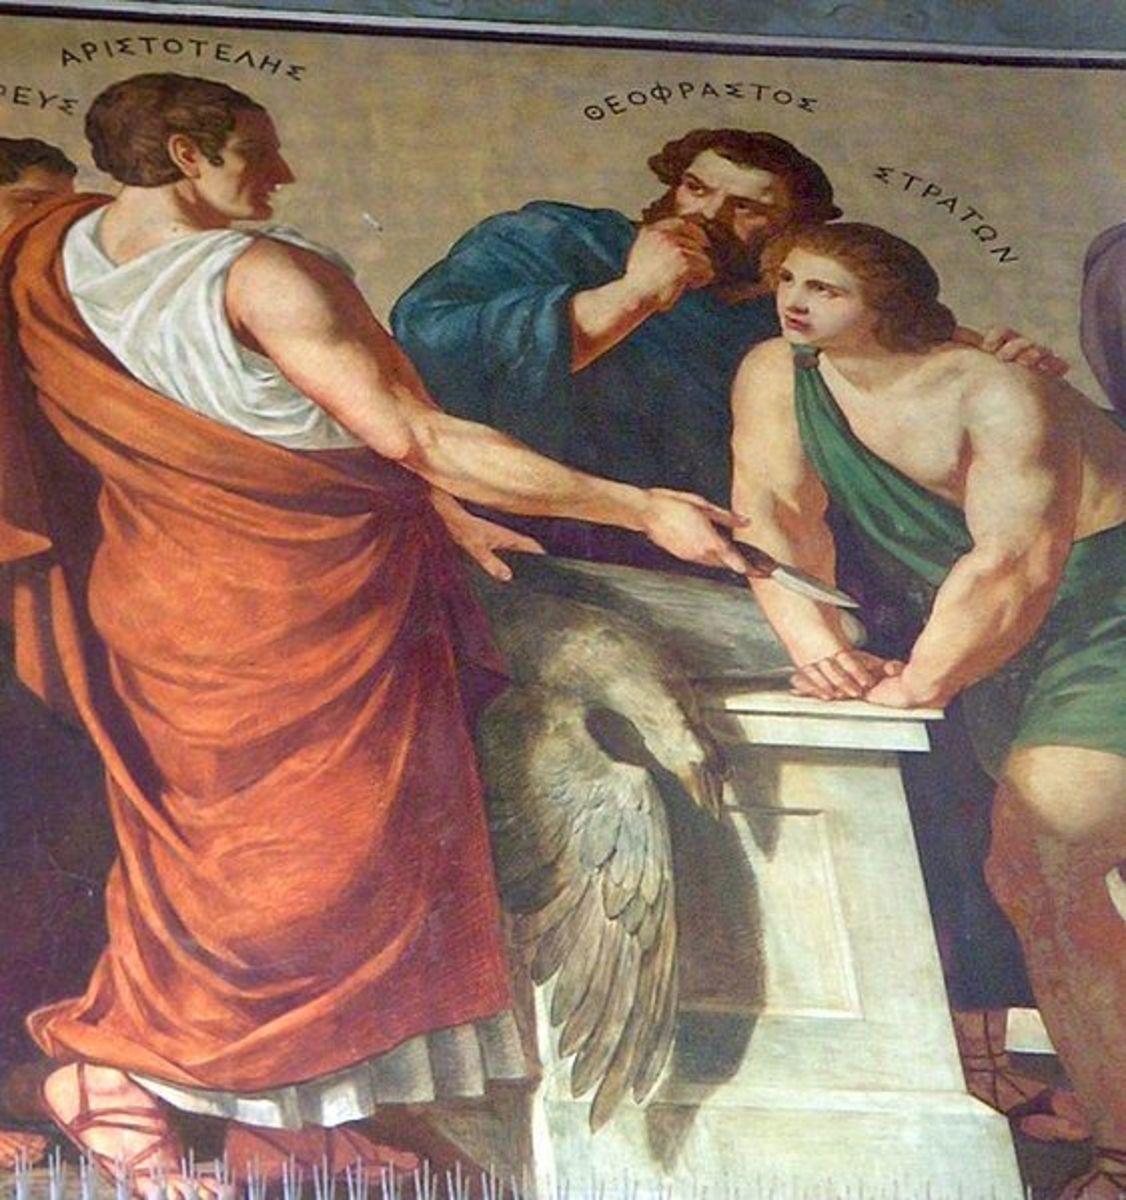 Theophrastus and Aristotle